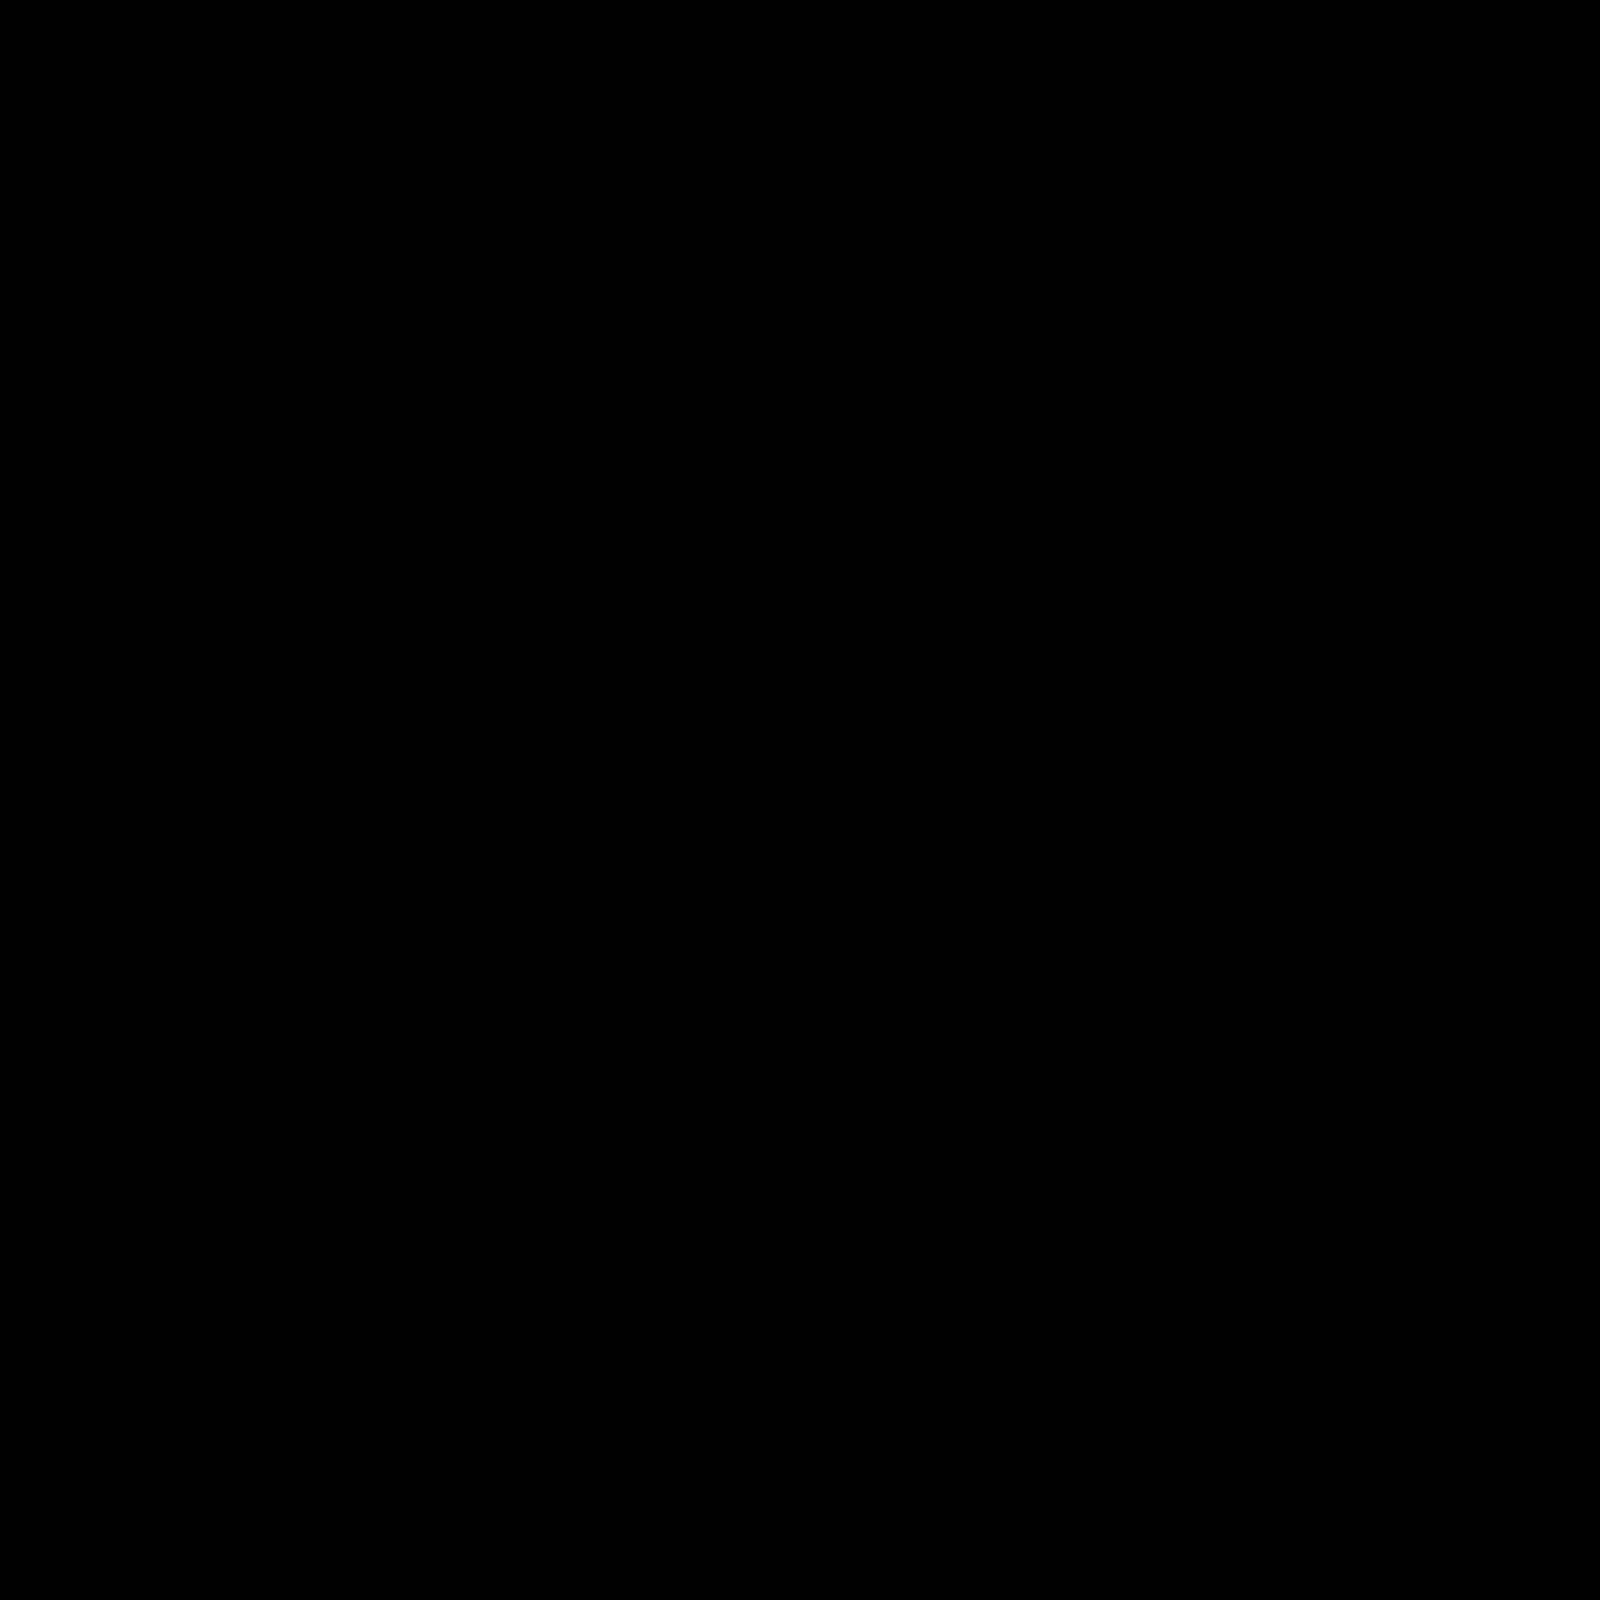 Corsair icon